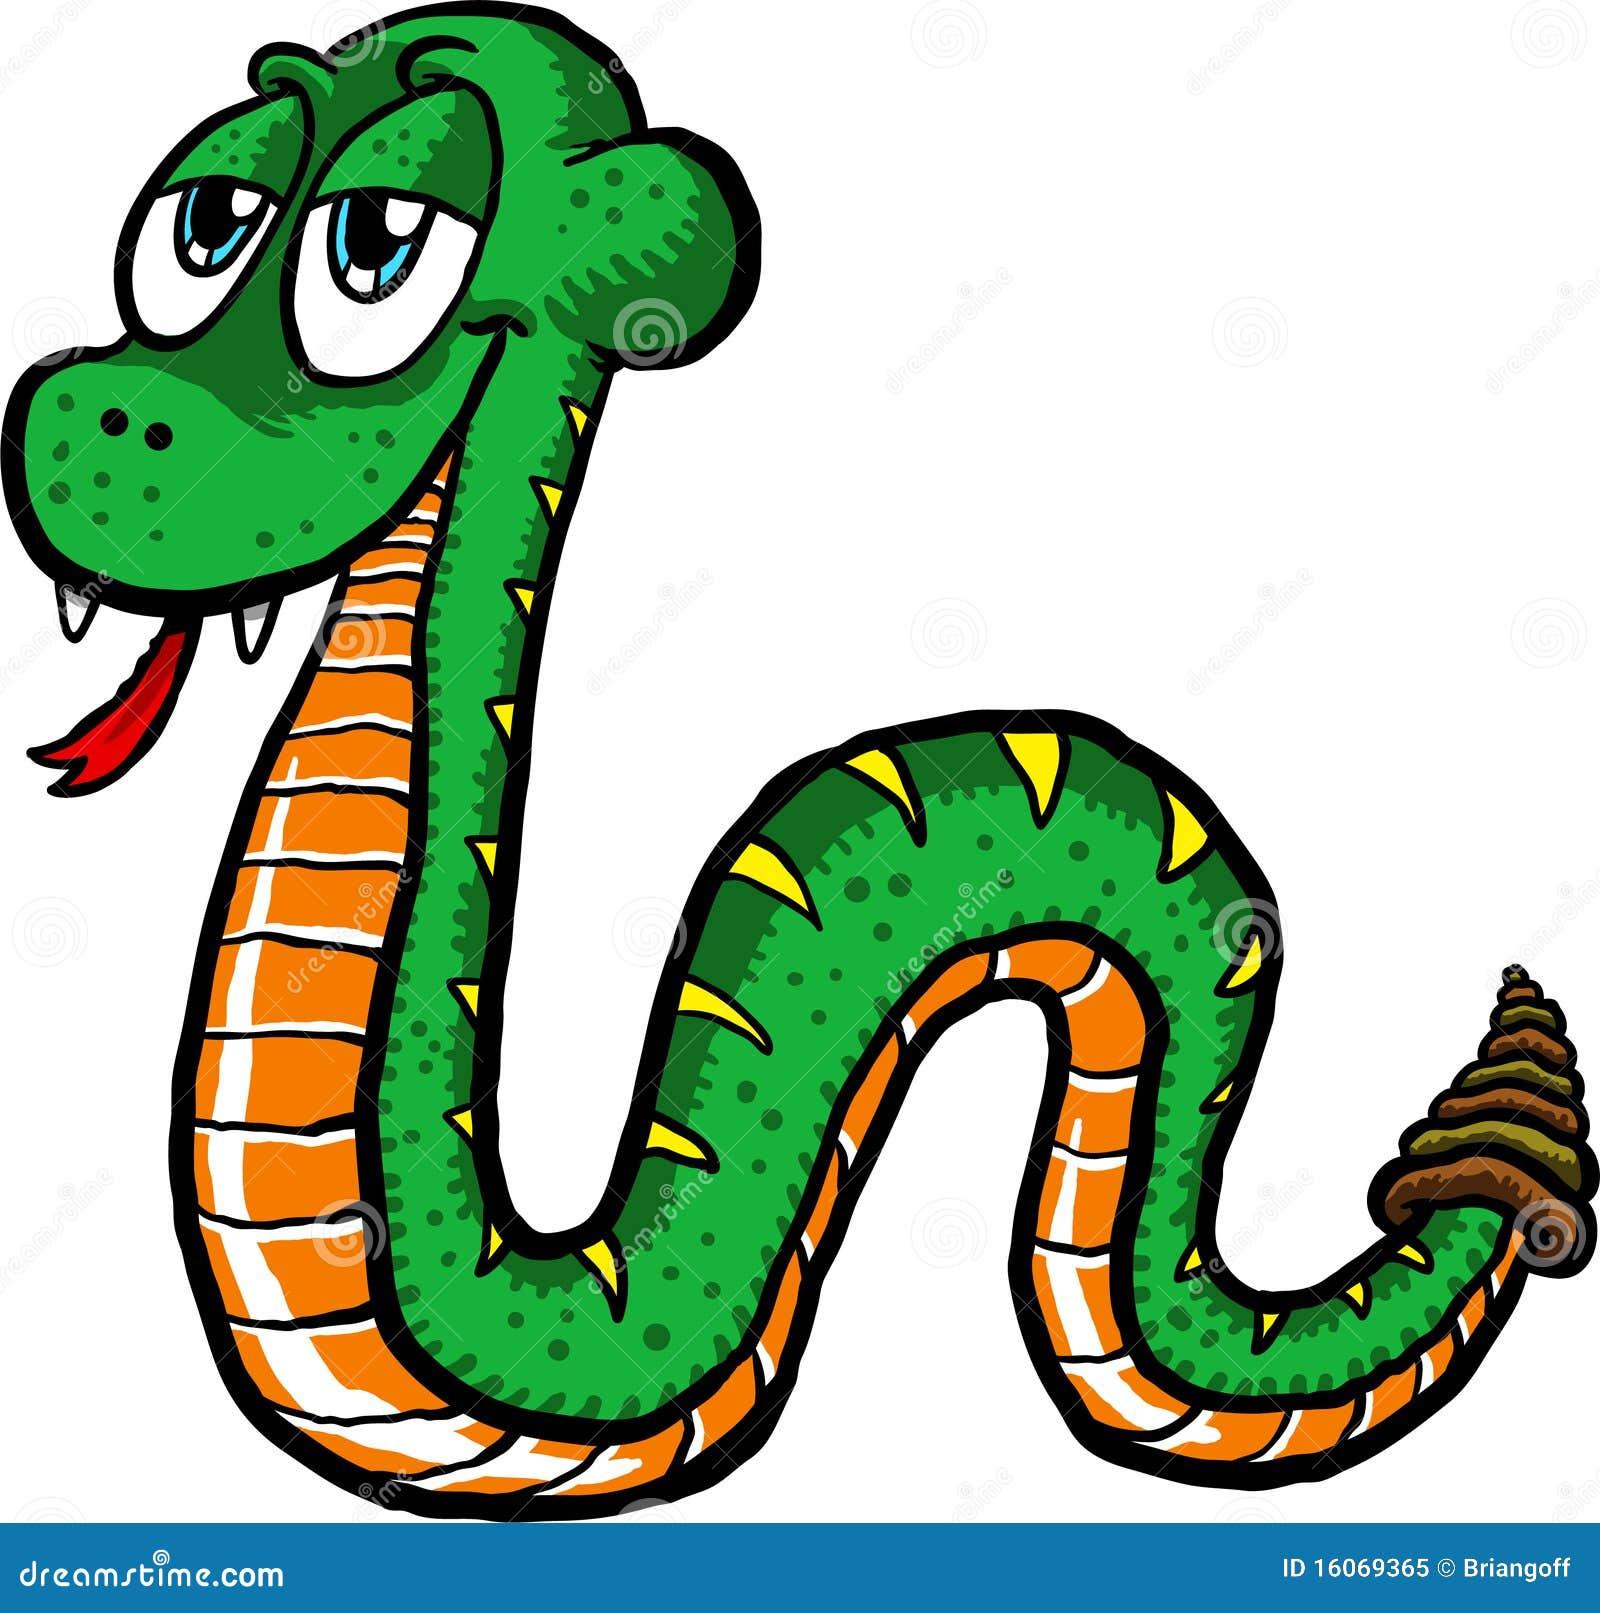 Vector illustration of a cute cartoon snake slithering along.